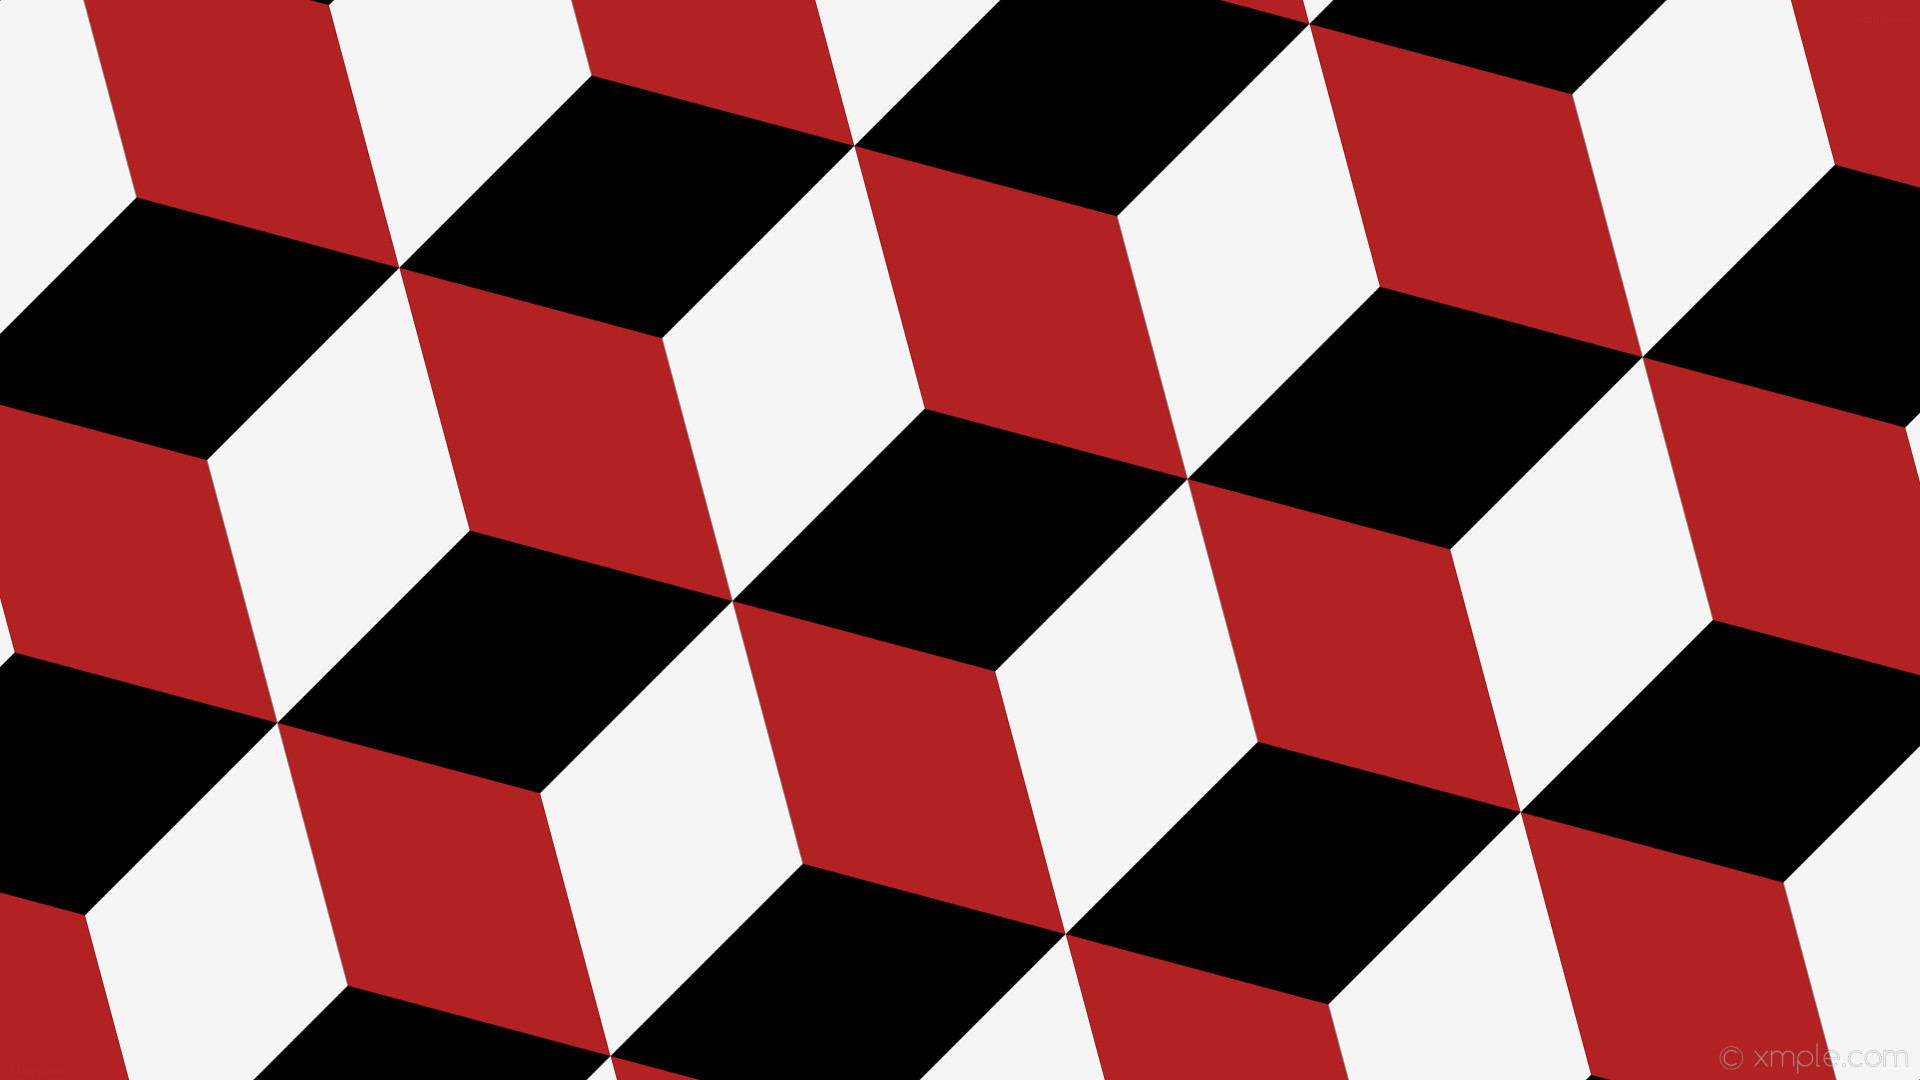 wallpaper red 3d cubes white black fire brick white smoke #000000 #b22222  #f5f5f5